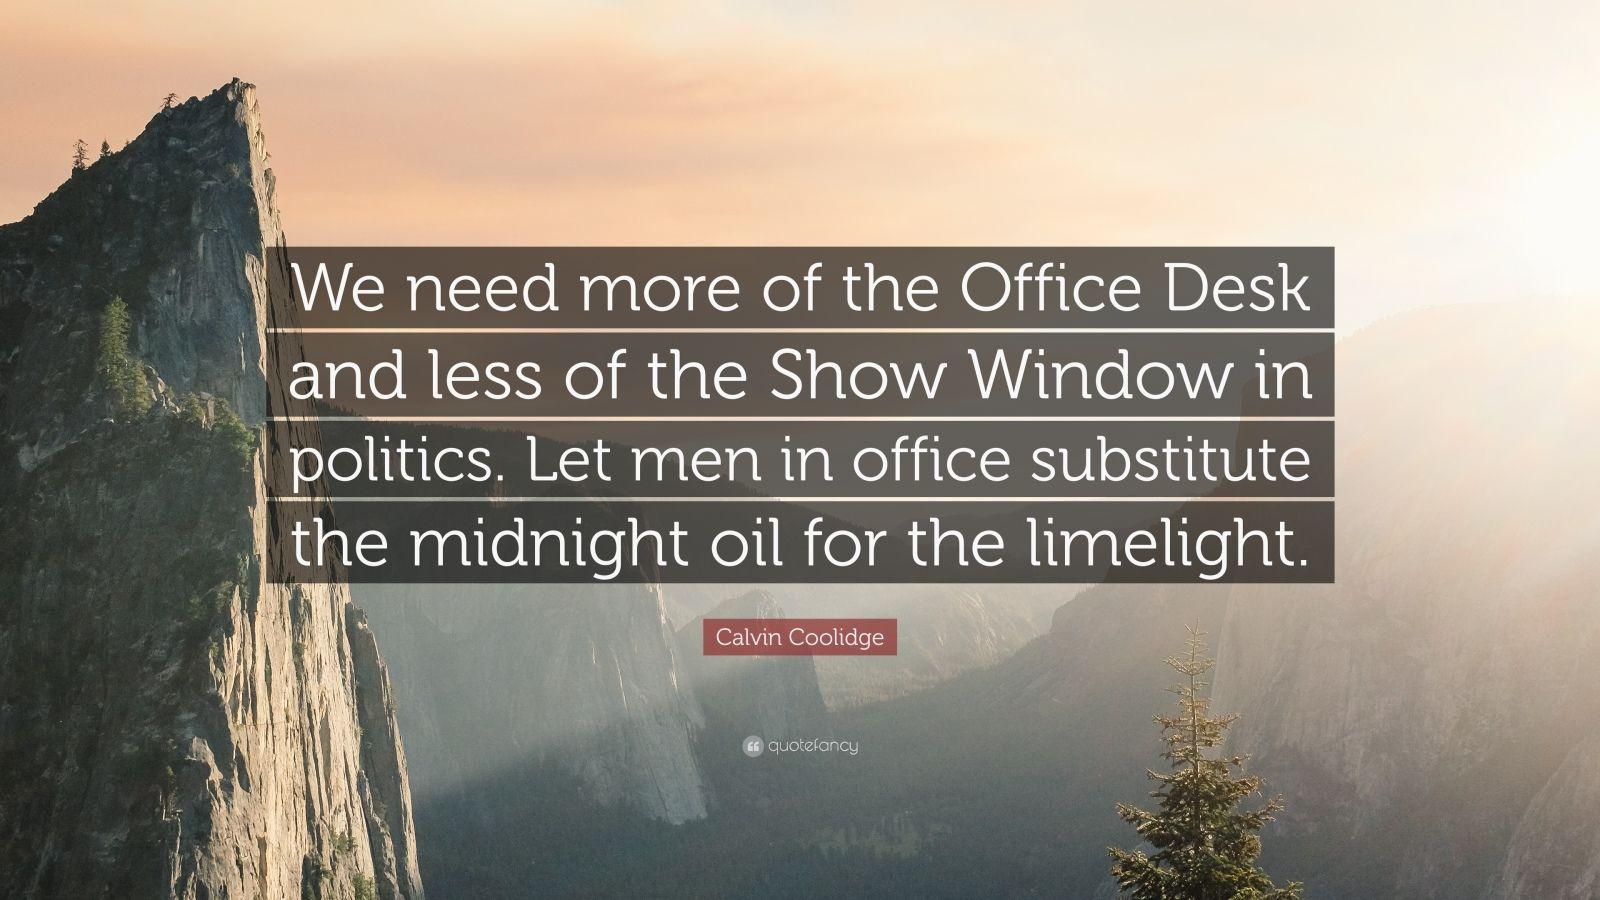 Calvin Coolidge Quotes (100 wallpapers) - Quotefancy